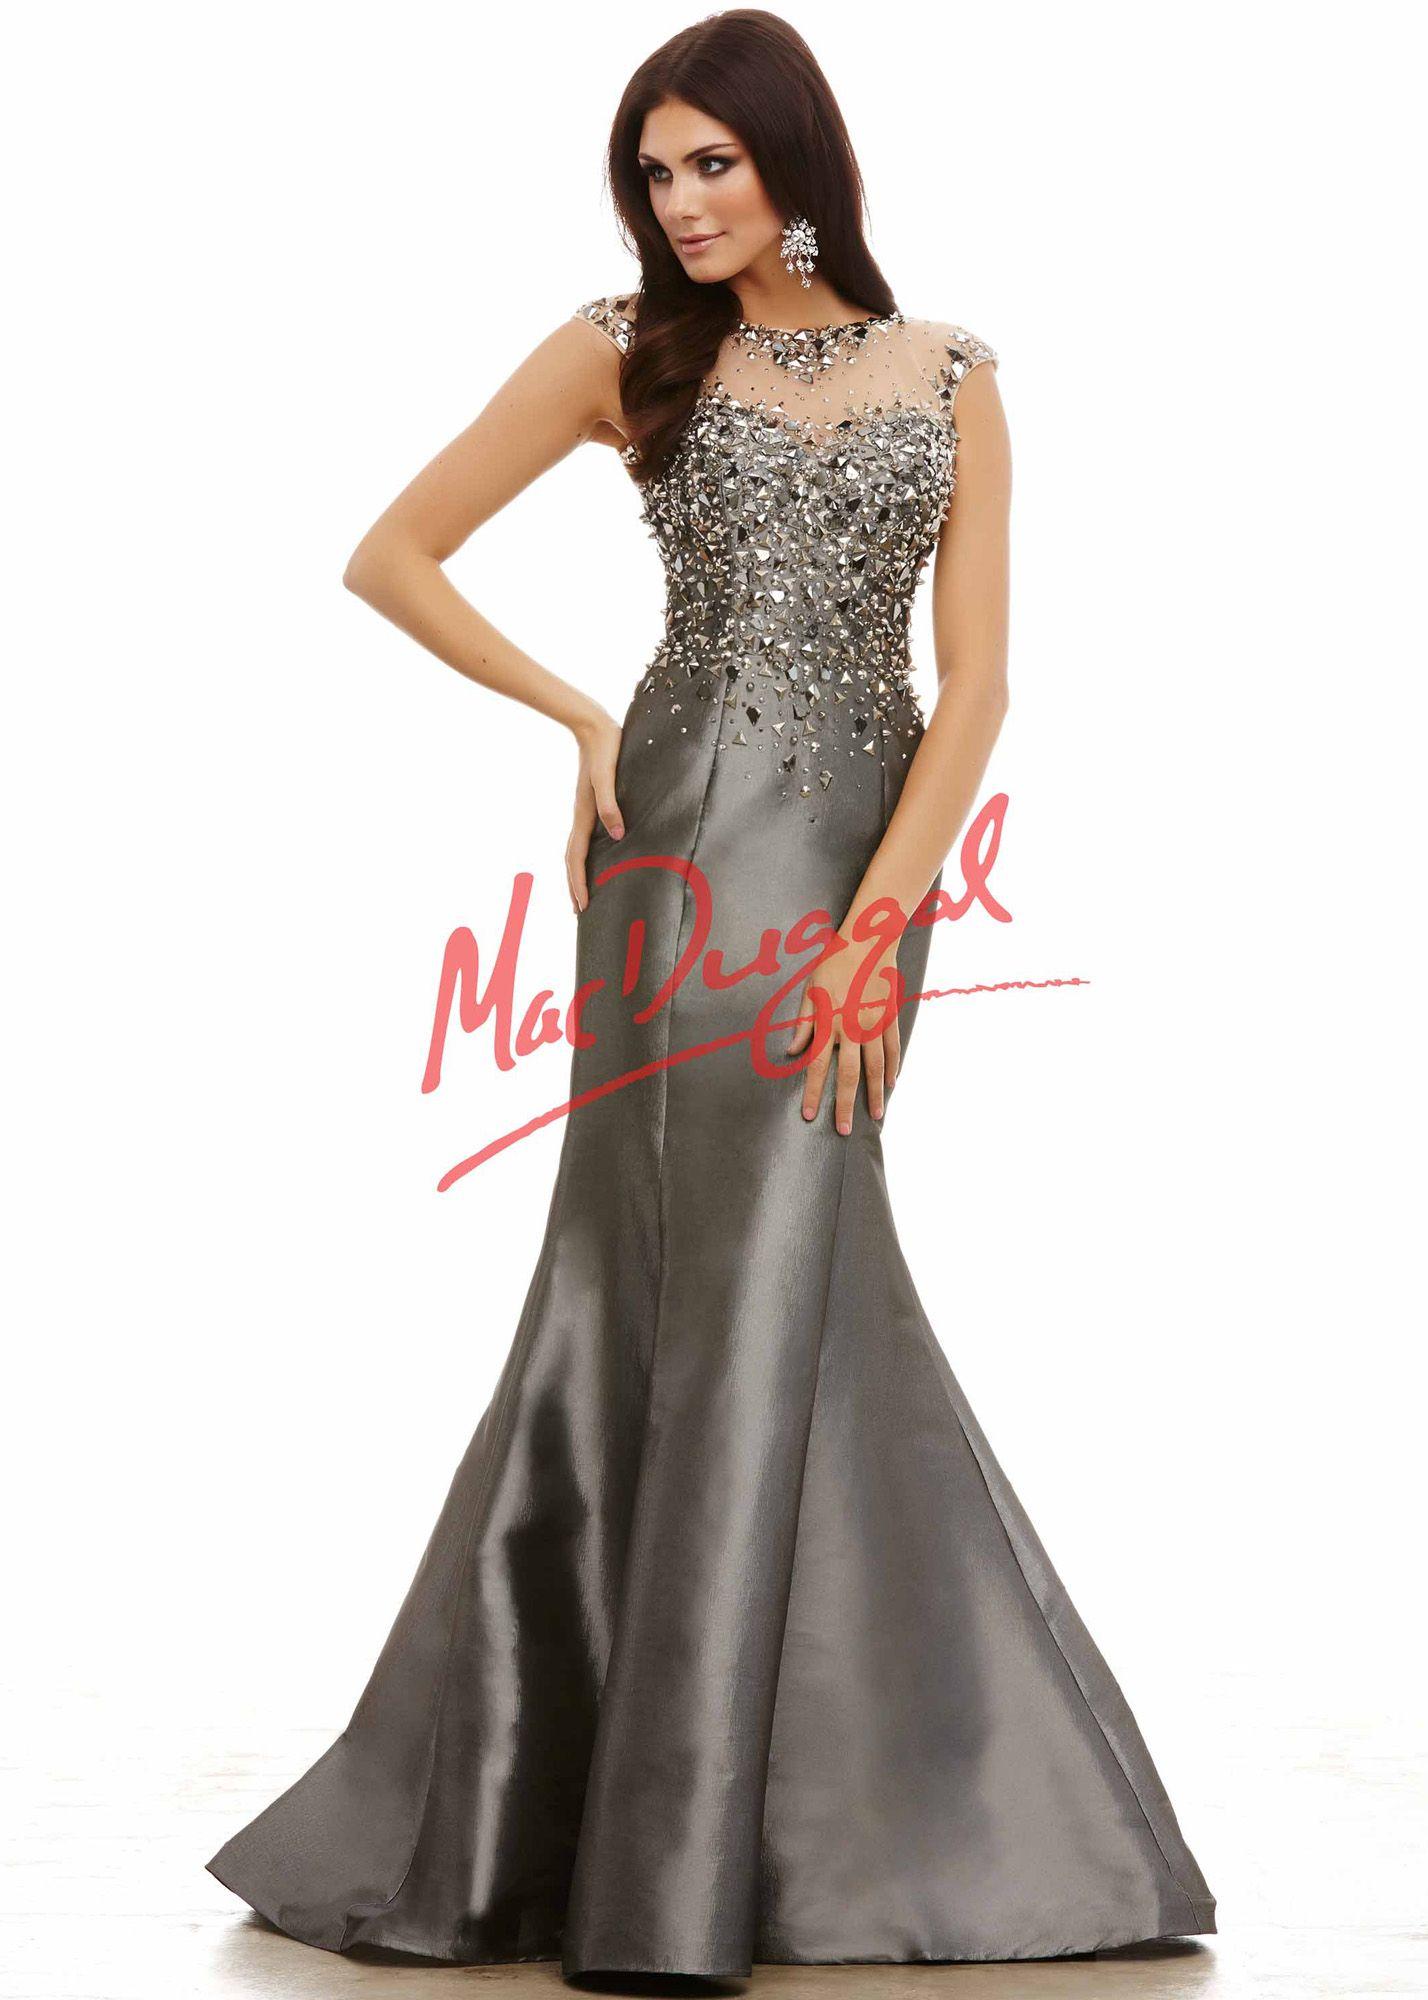 80a4de2de8d Cassandra Stone by Mac Duggal 82386 Glamorous Mermaid Gown - Gorgeous MOB  Dress - Stunning Pageant Gown